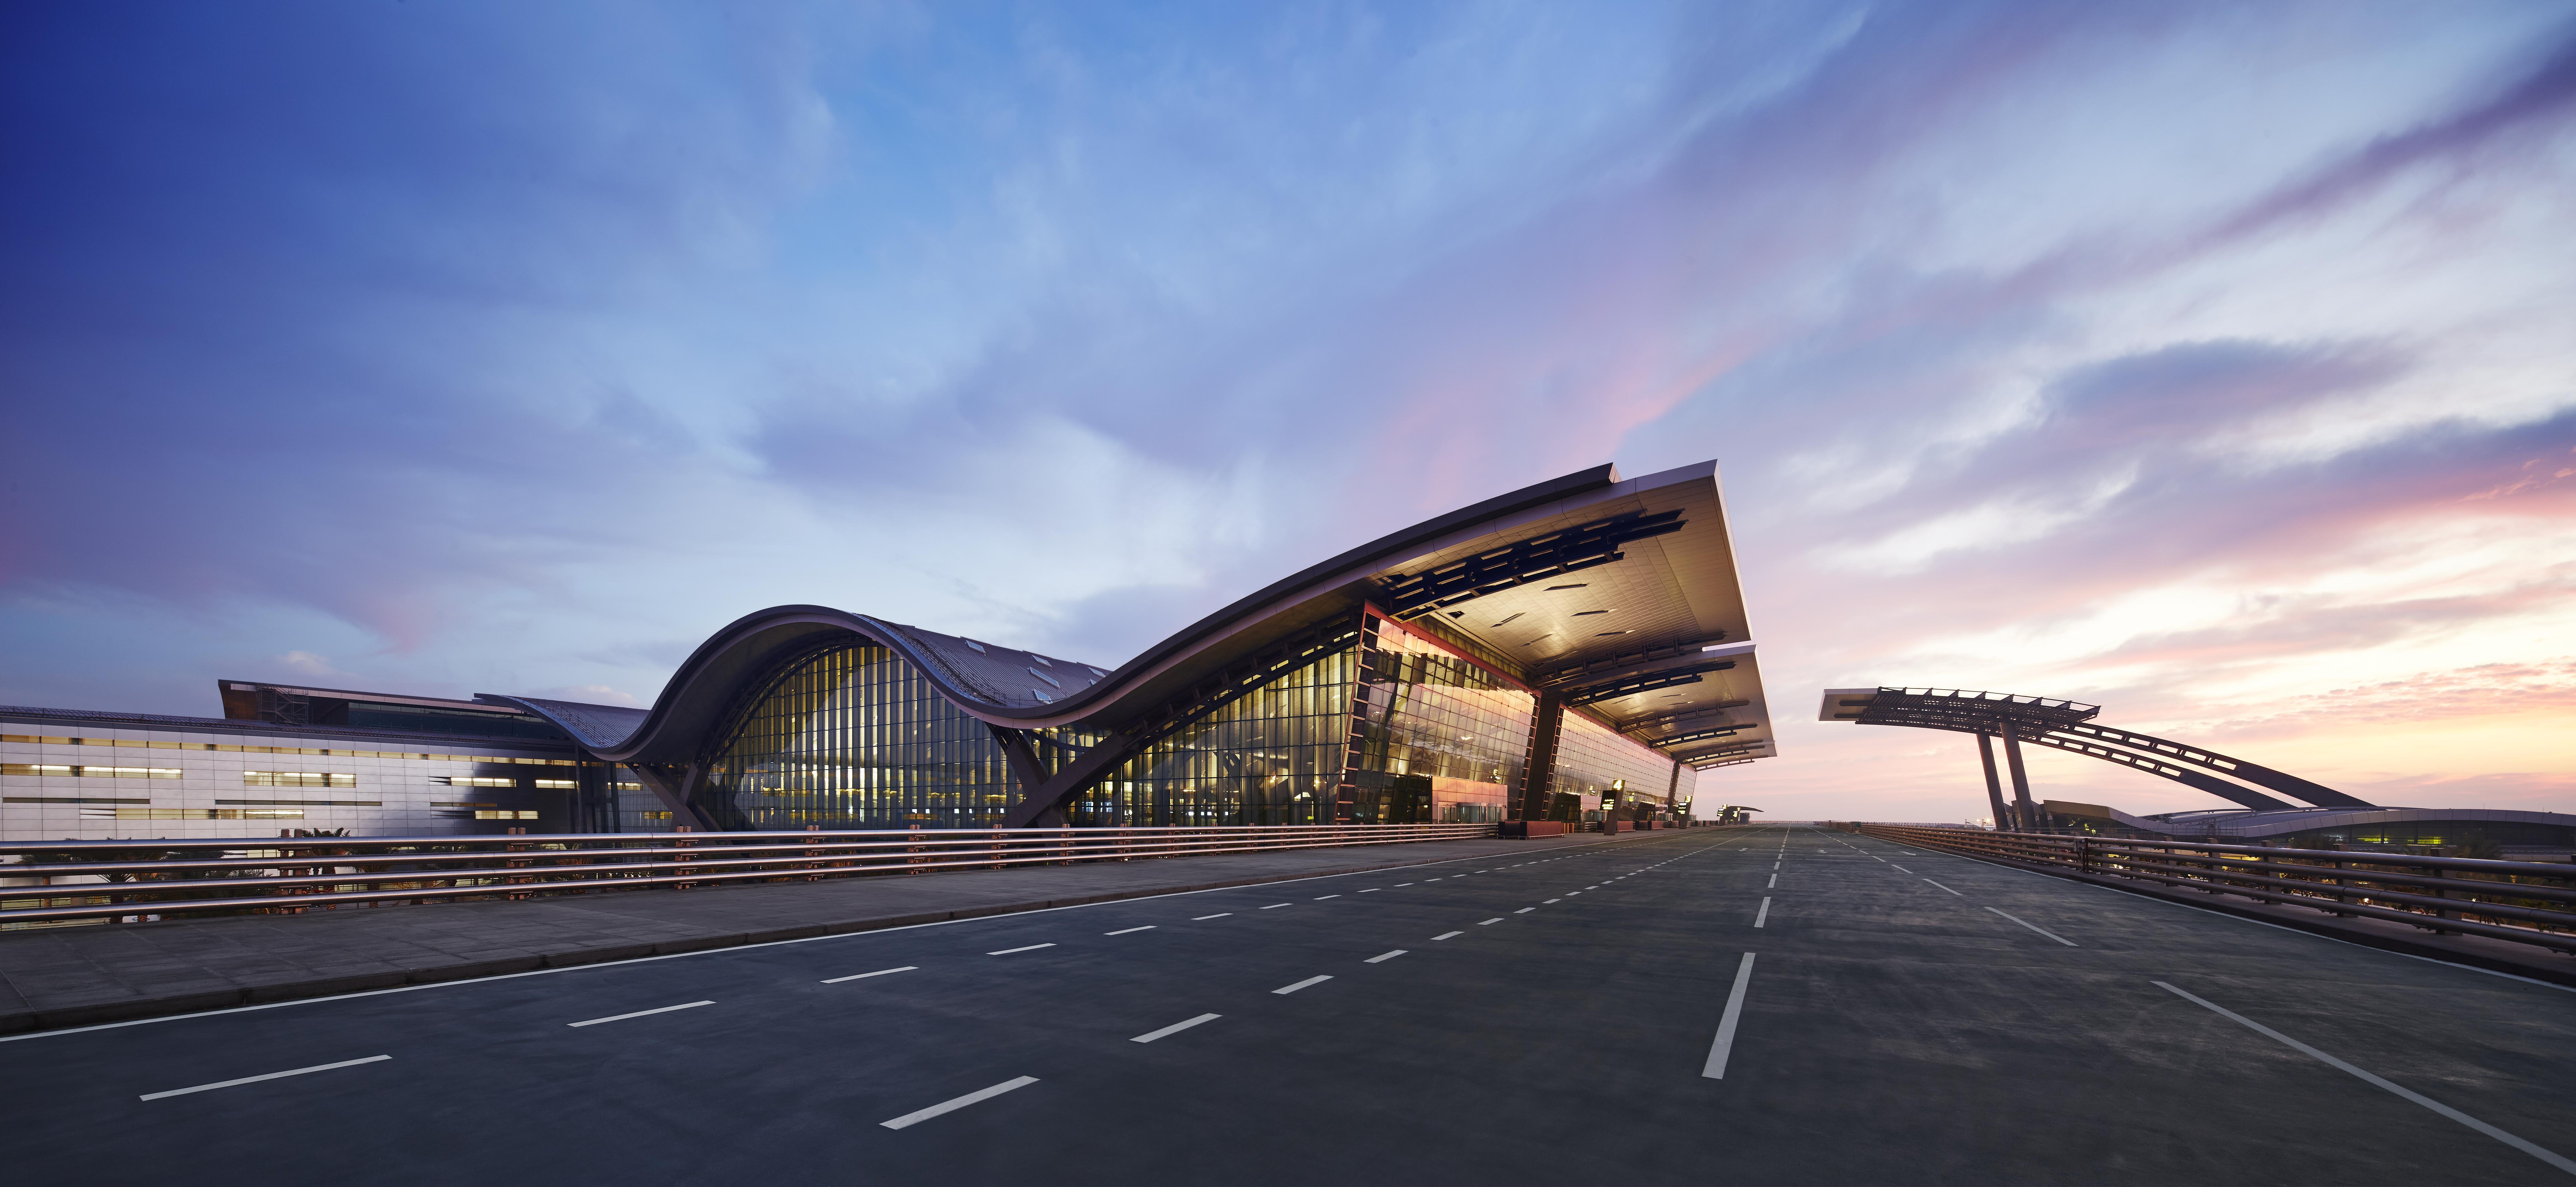 HIA-Doha-Passenger-Terminal-At-Sunset